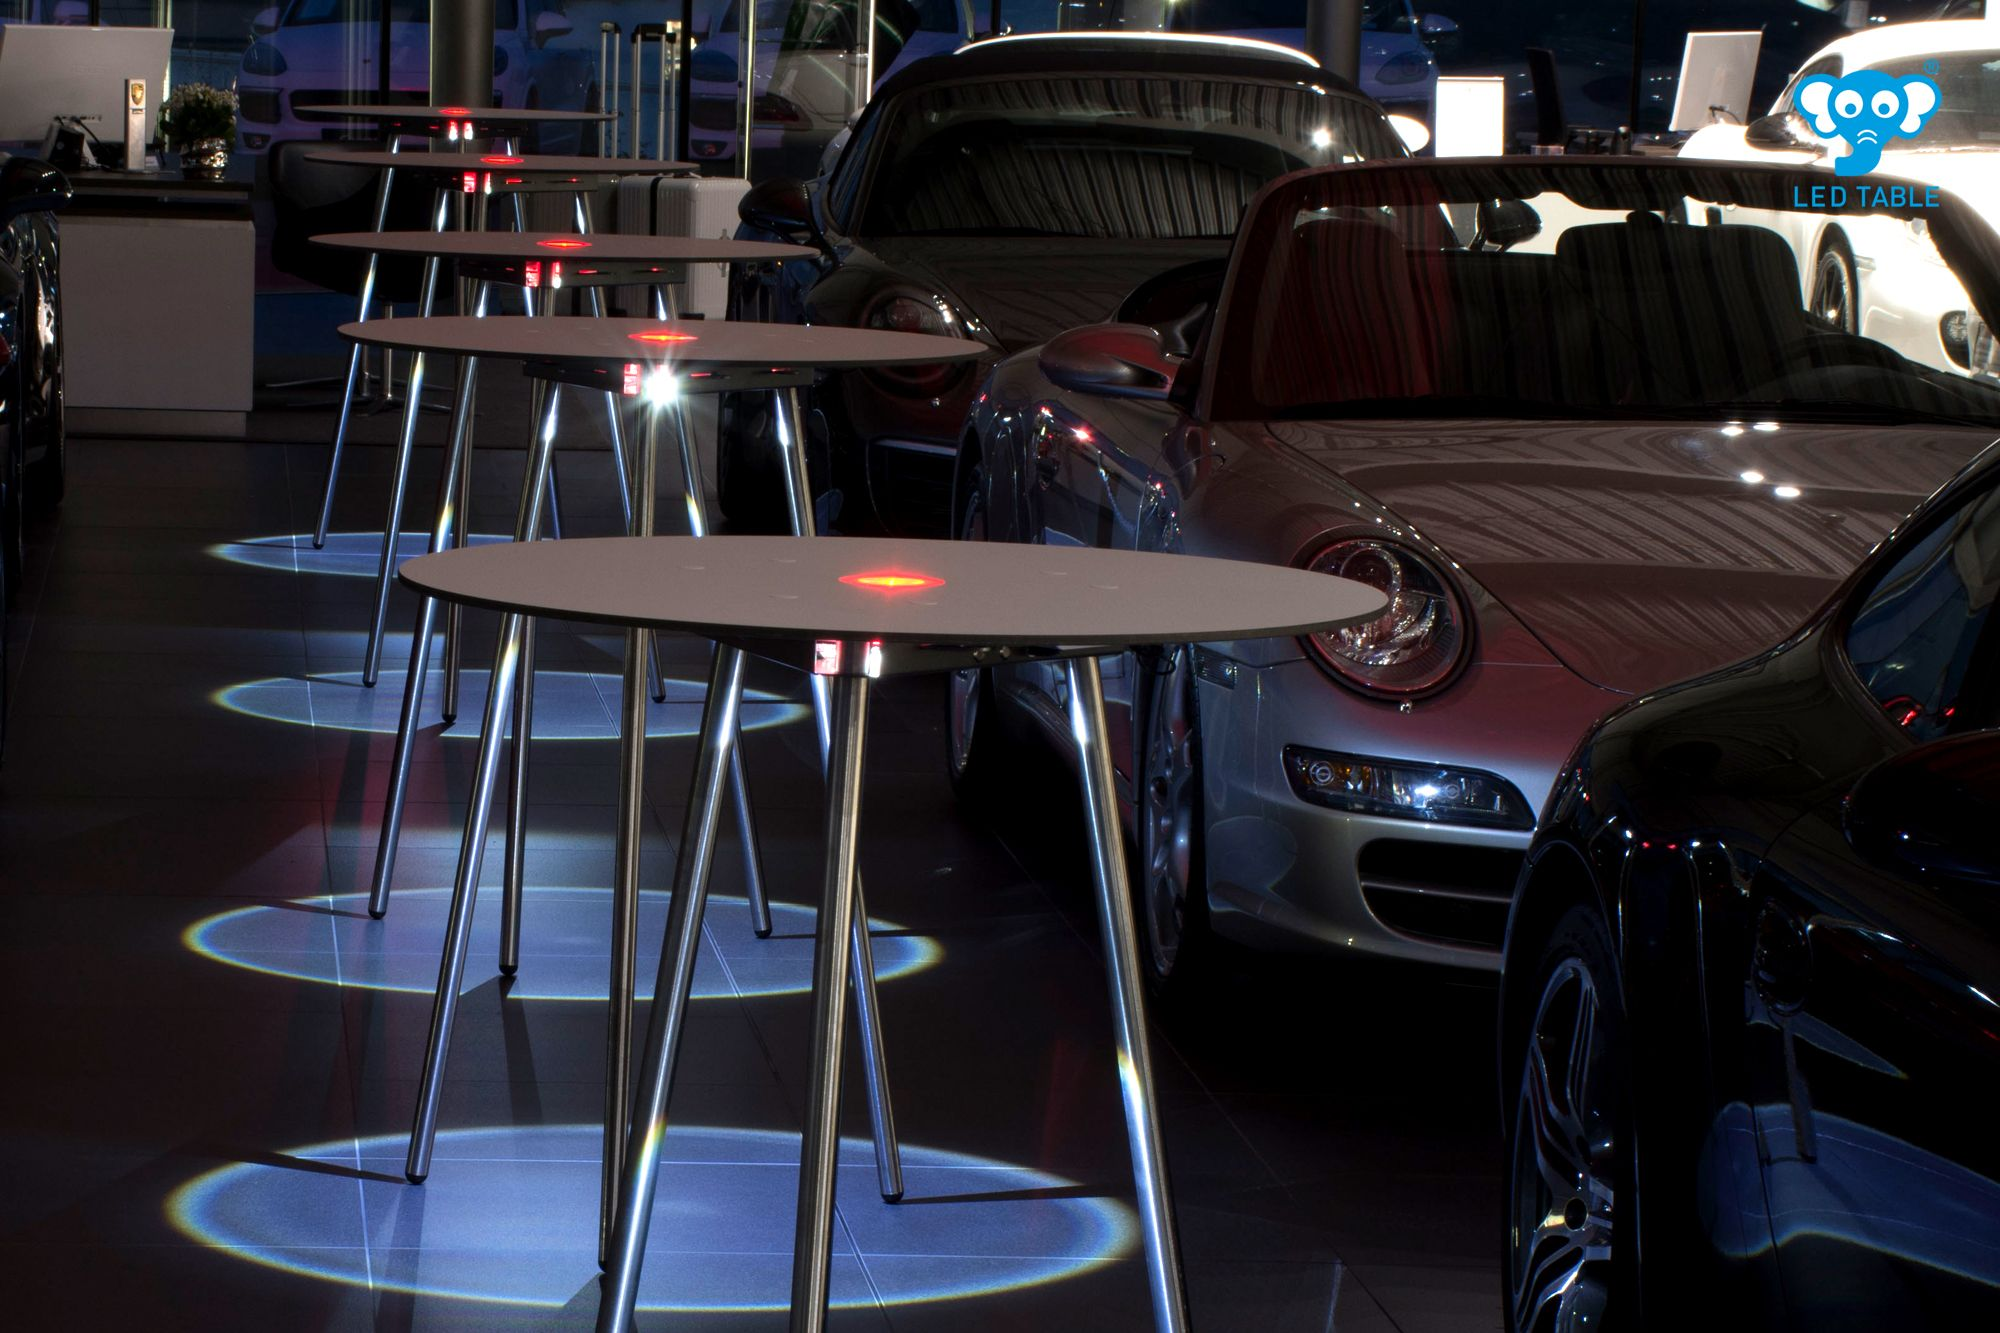 Led Cocktail Table At Porsche Zentrum Tisch Led